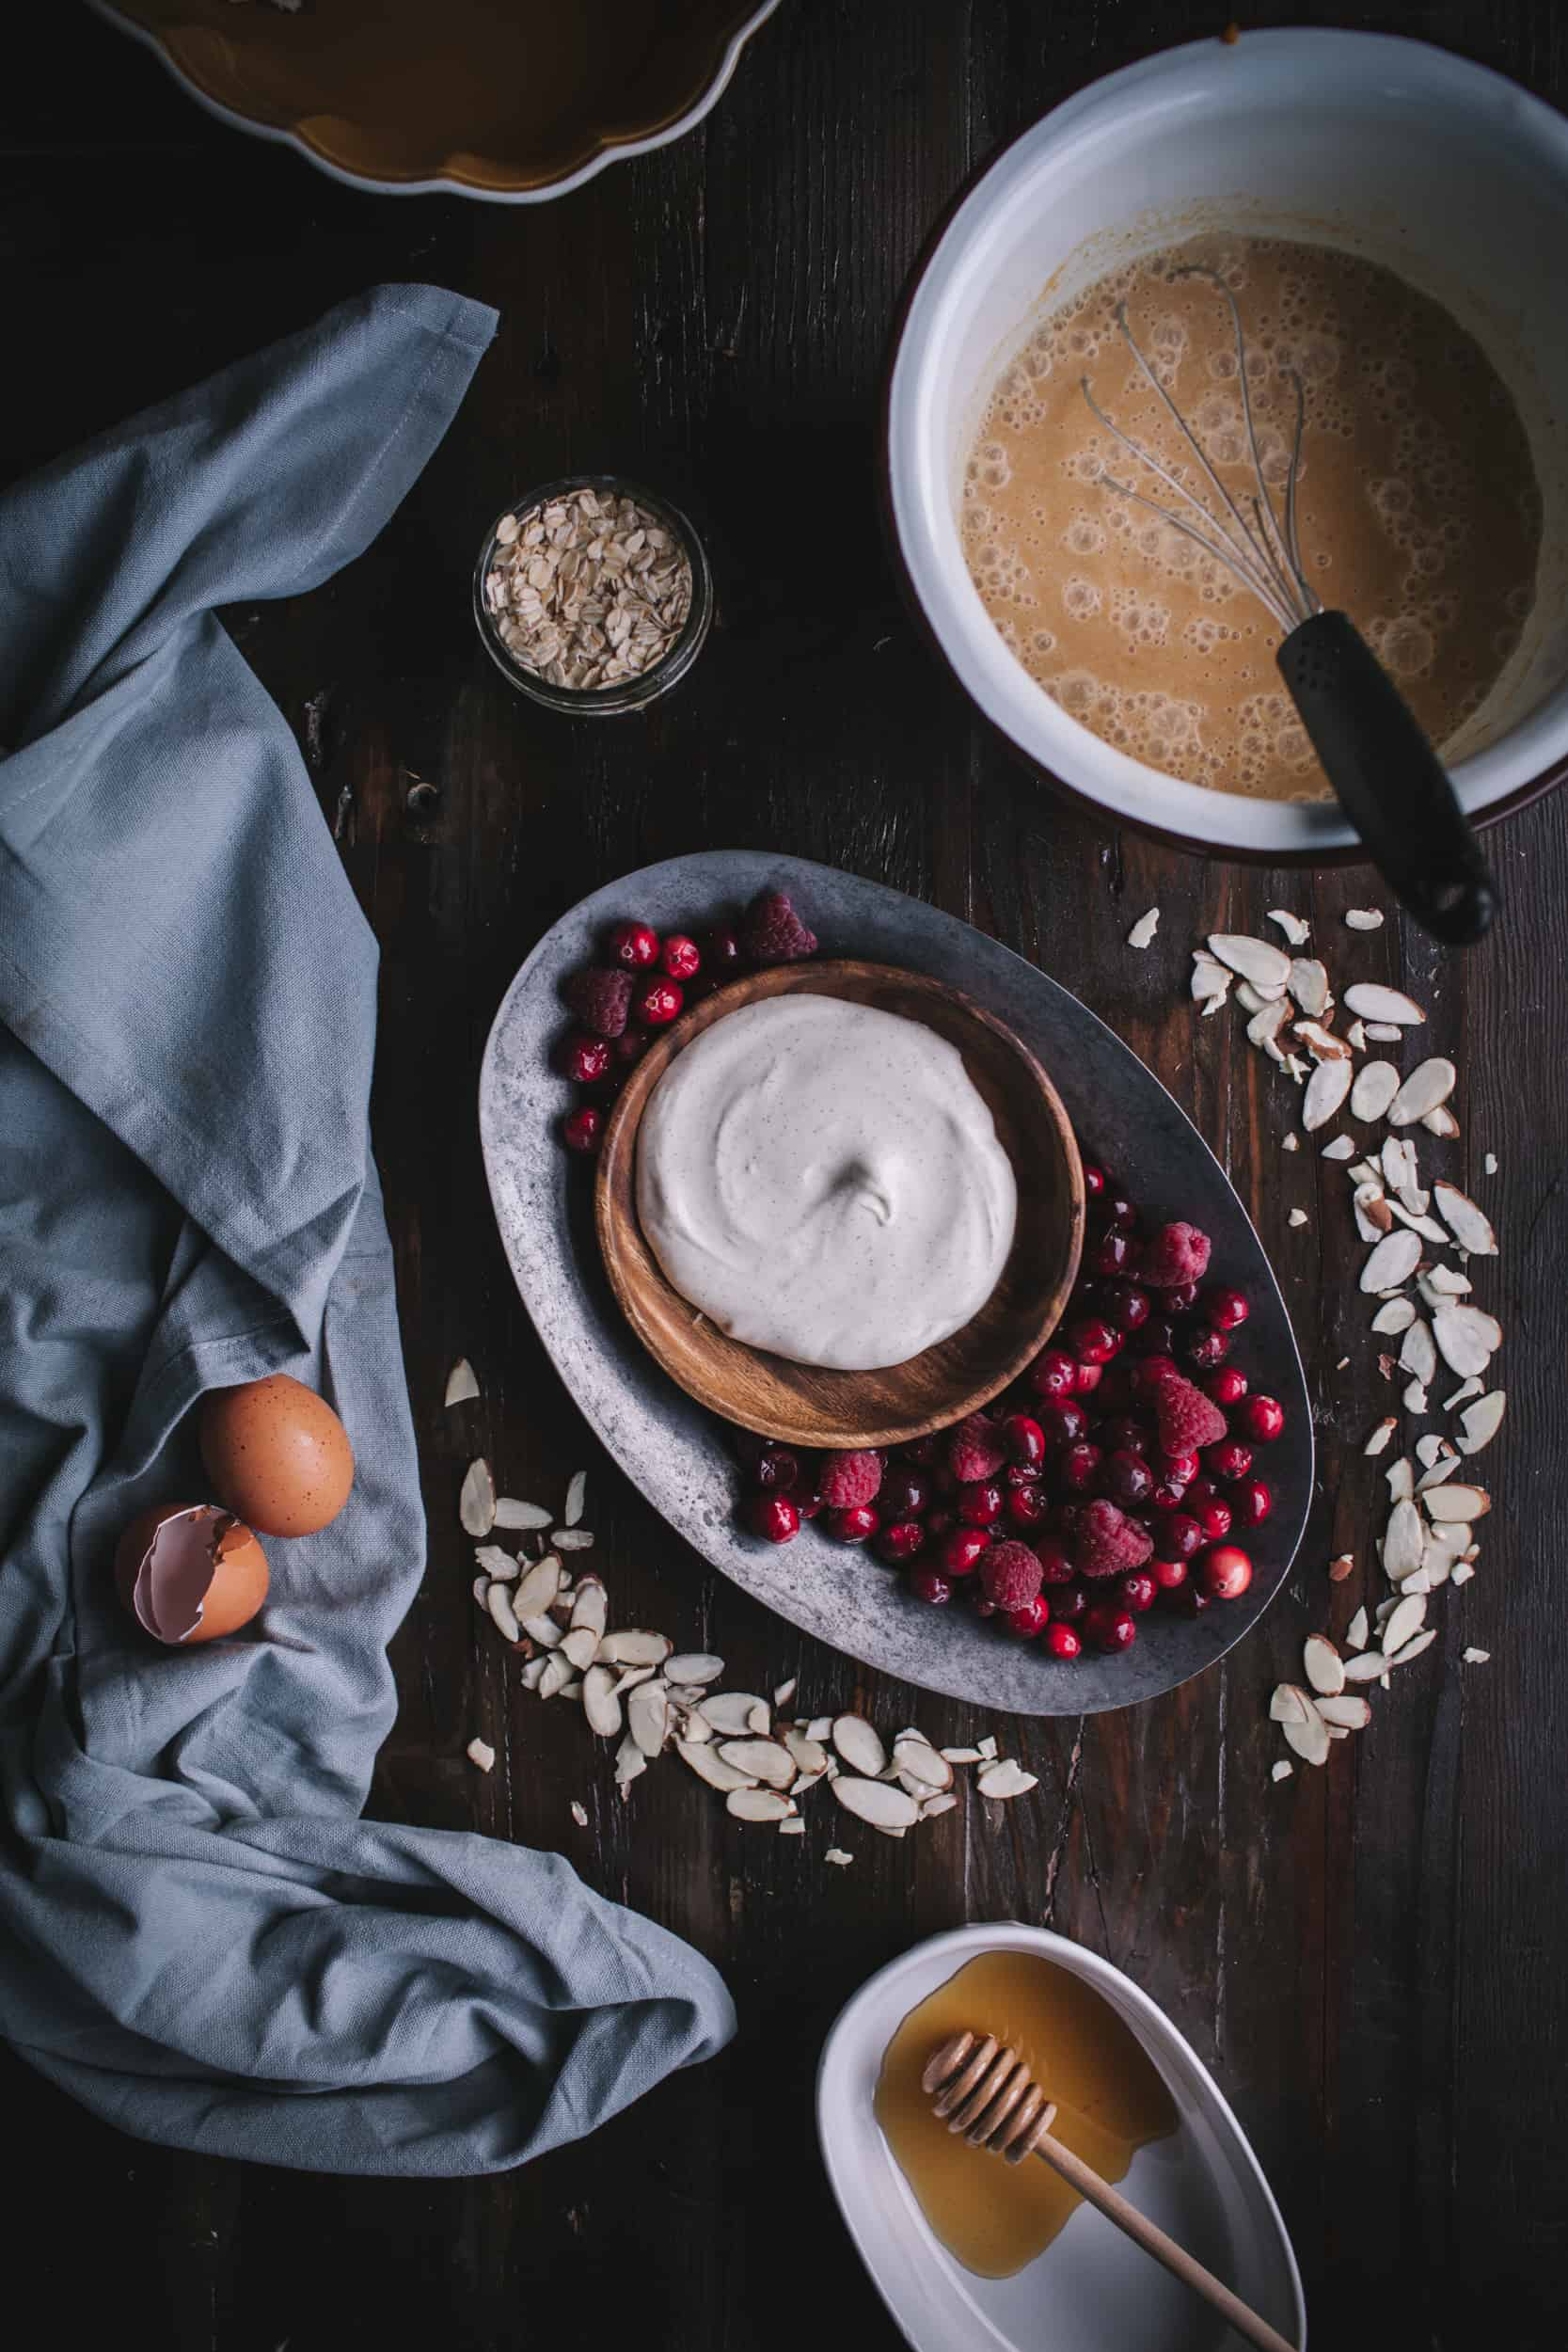 Baked Pumpkin, Cranberry, & Raspberry Oatmeal With Vanilla Creme Fraiche by Eva Kosmas Flores